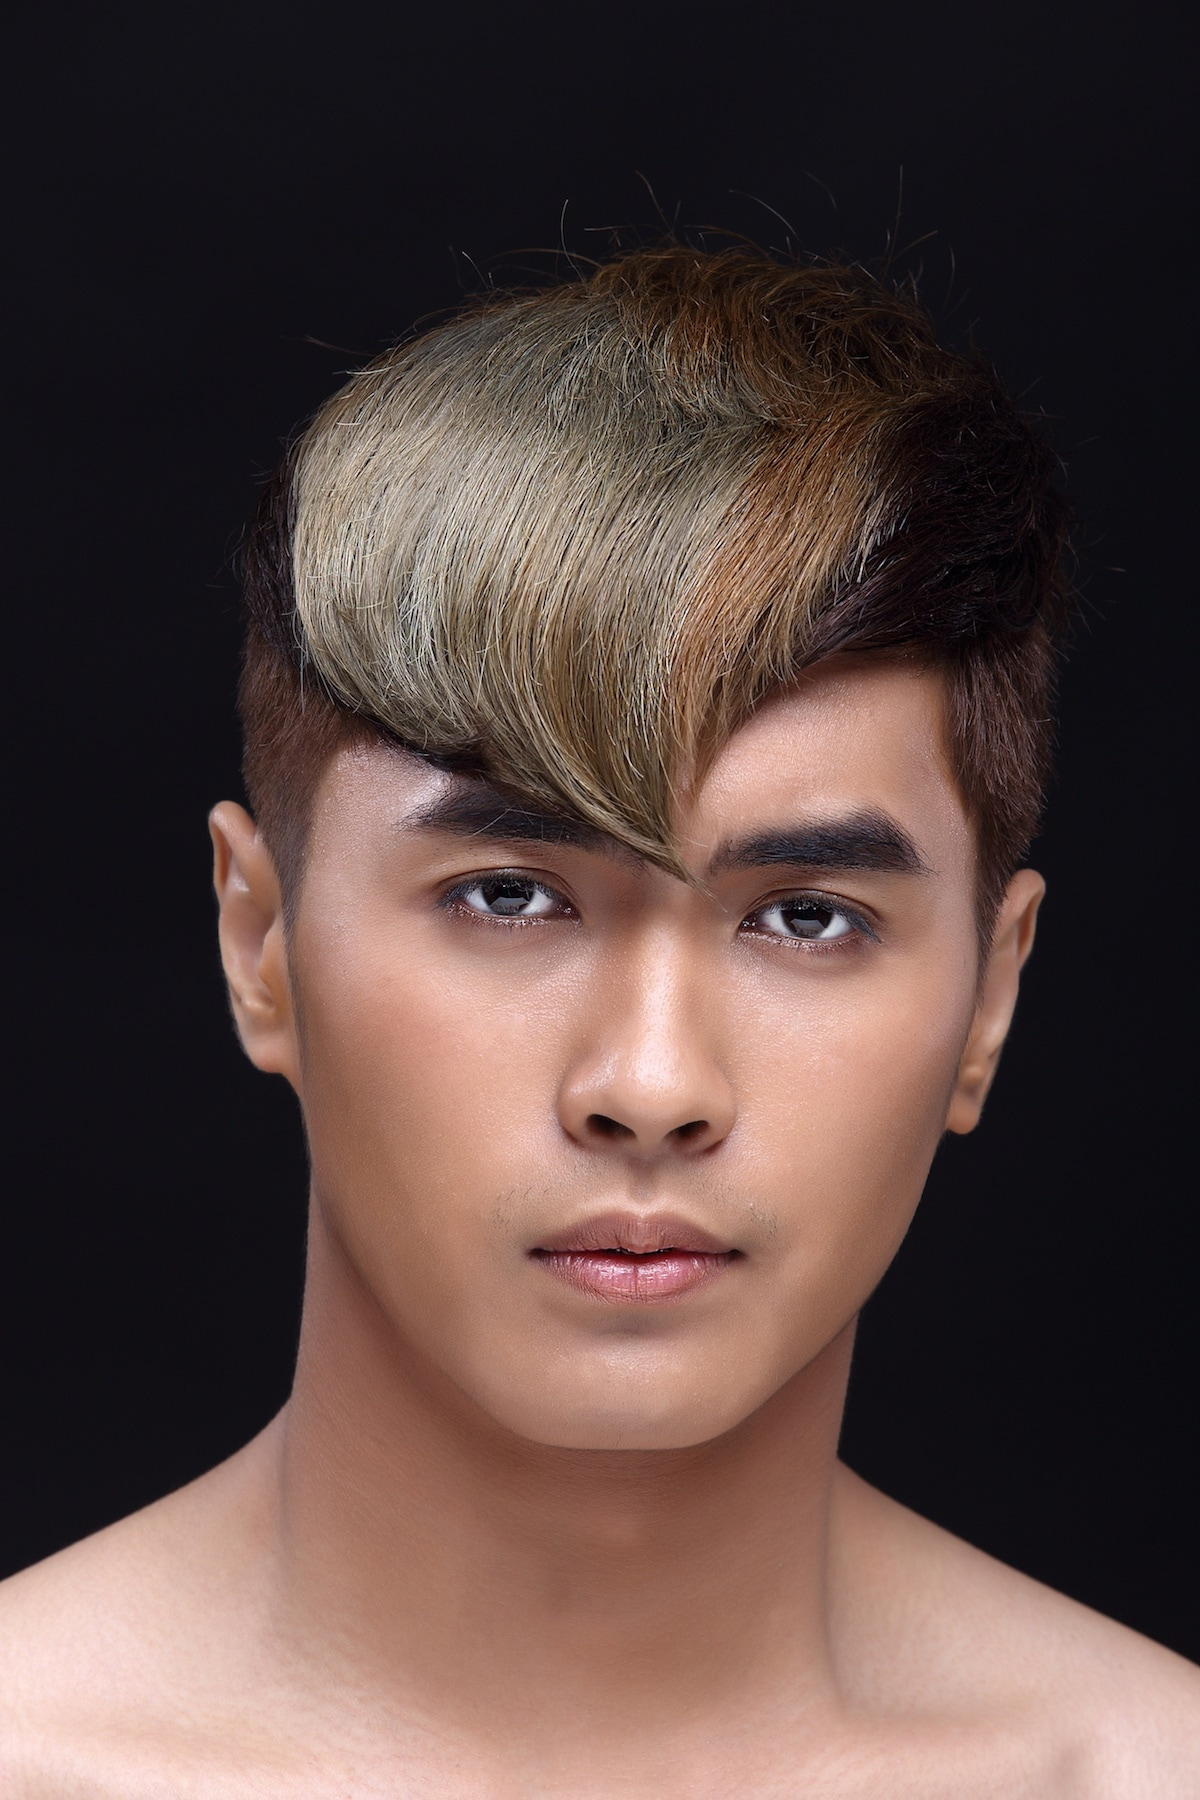 Trend warna rambut pria 2018 warna rambut ashy green dan bronze.